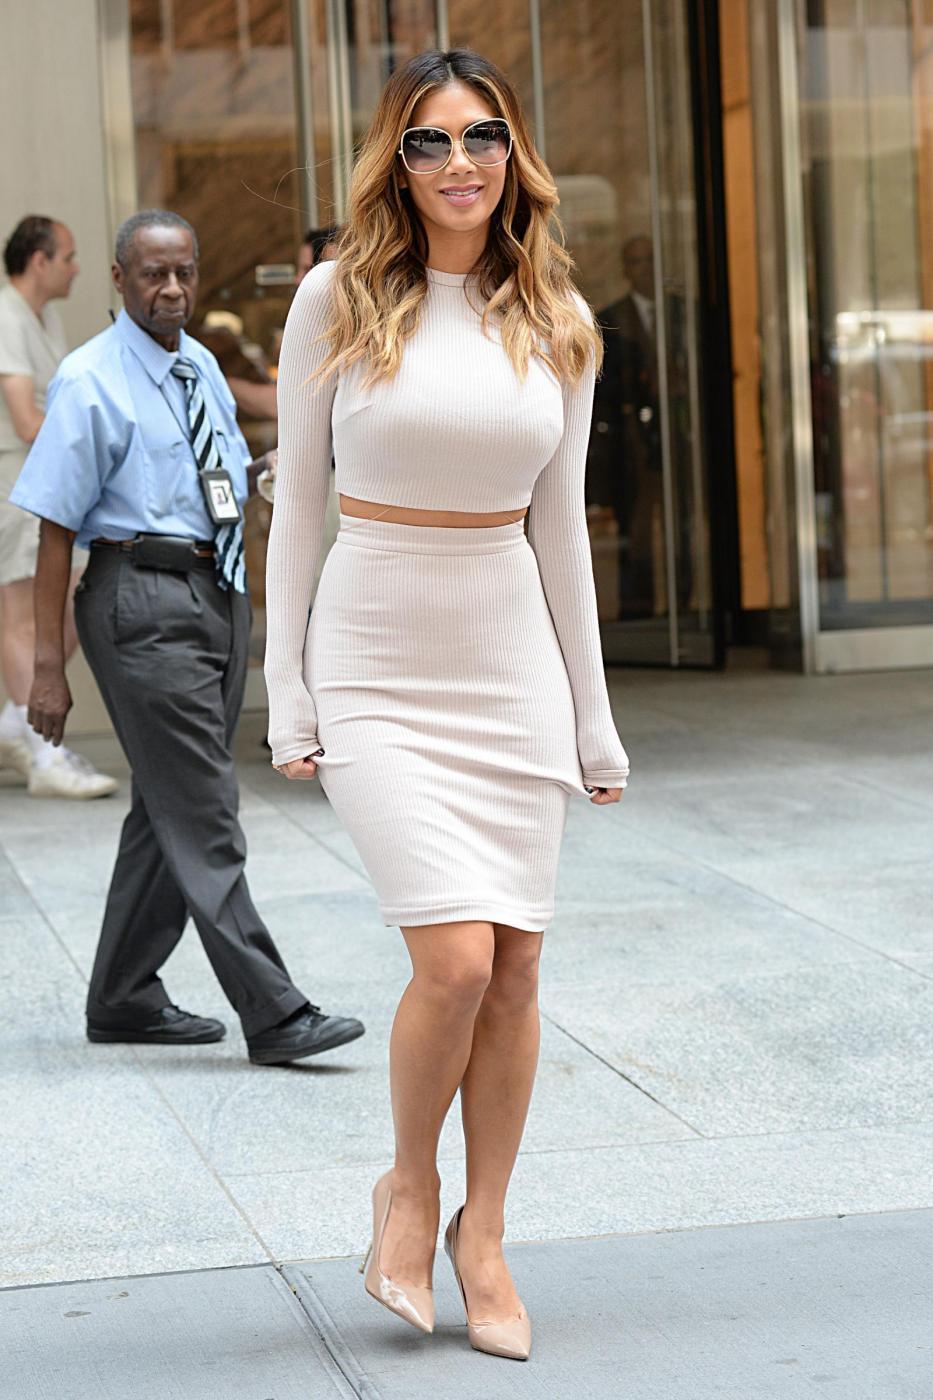 Nicole Scherzinger sempre più curvy e...bionda. Abiti super aderenti a New York FOTO 20